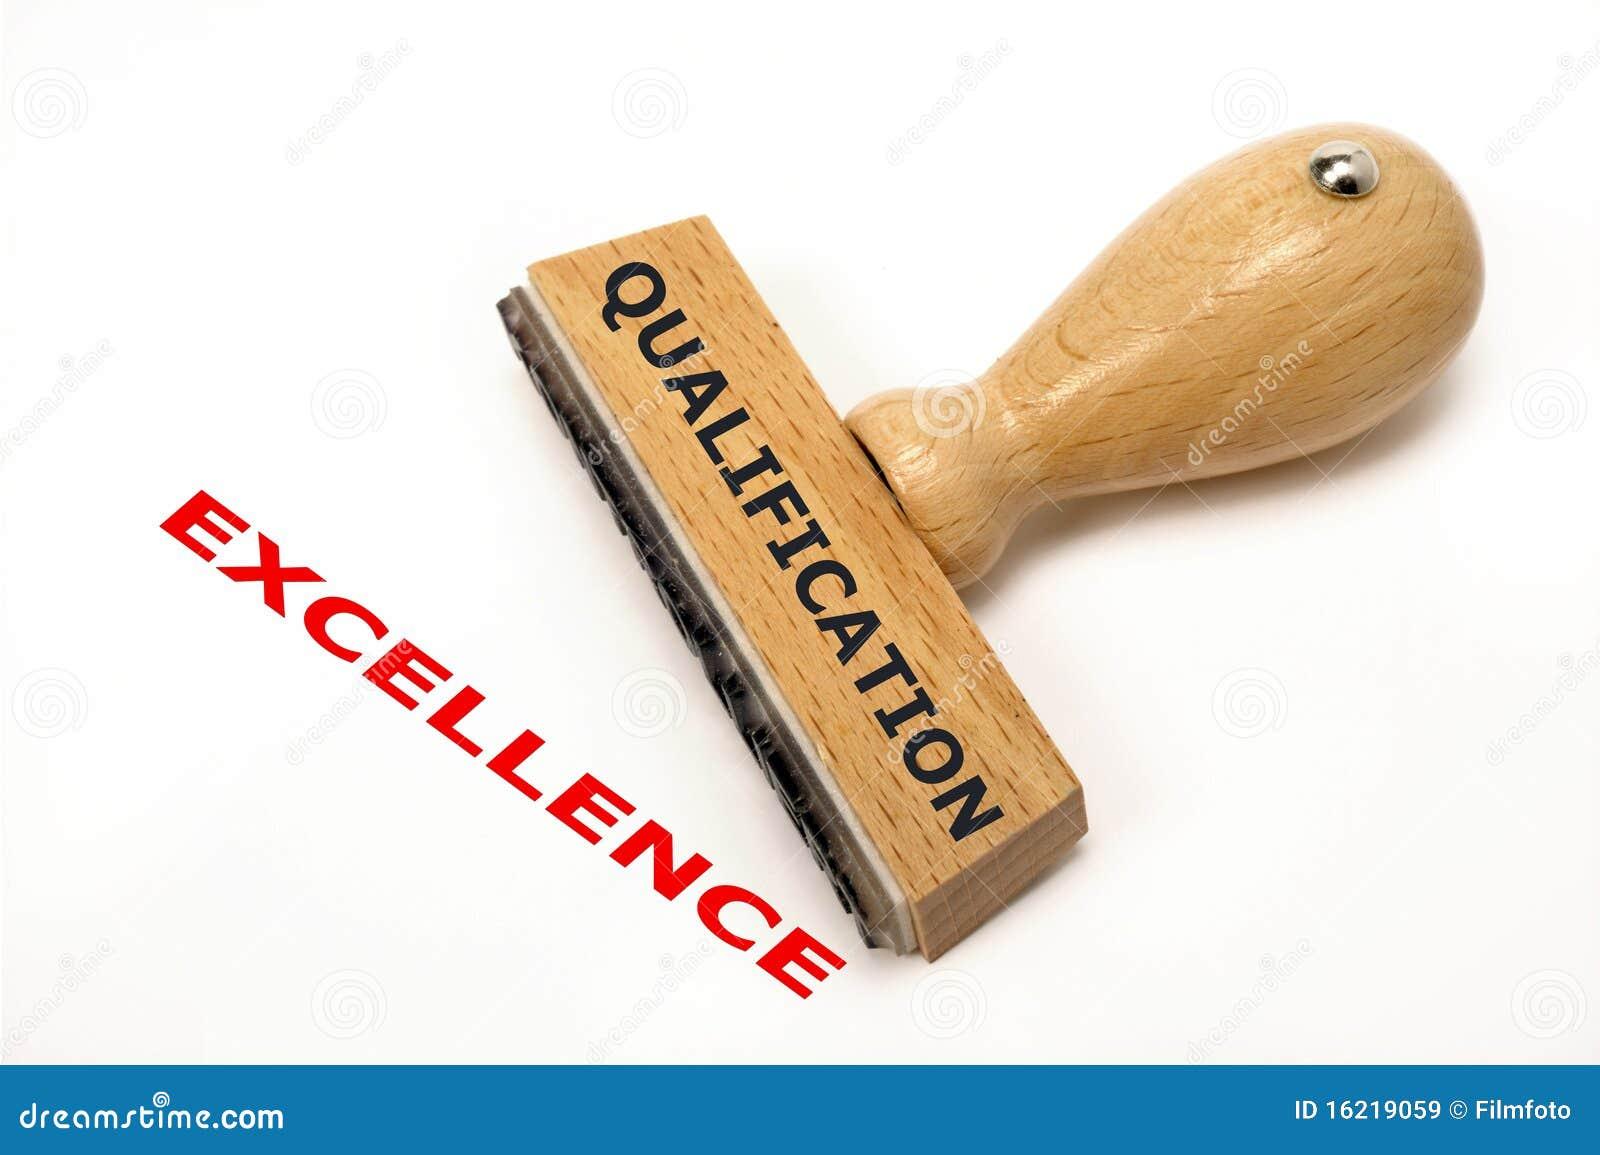 Qualifikationshervorragende leistung